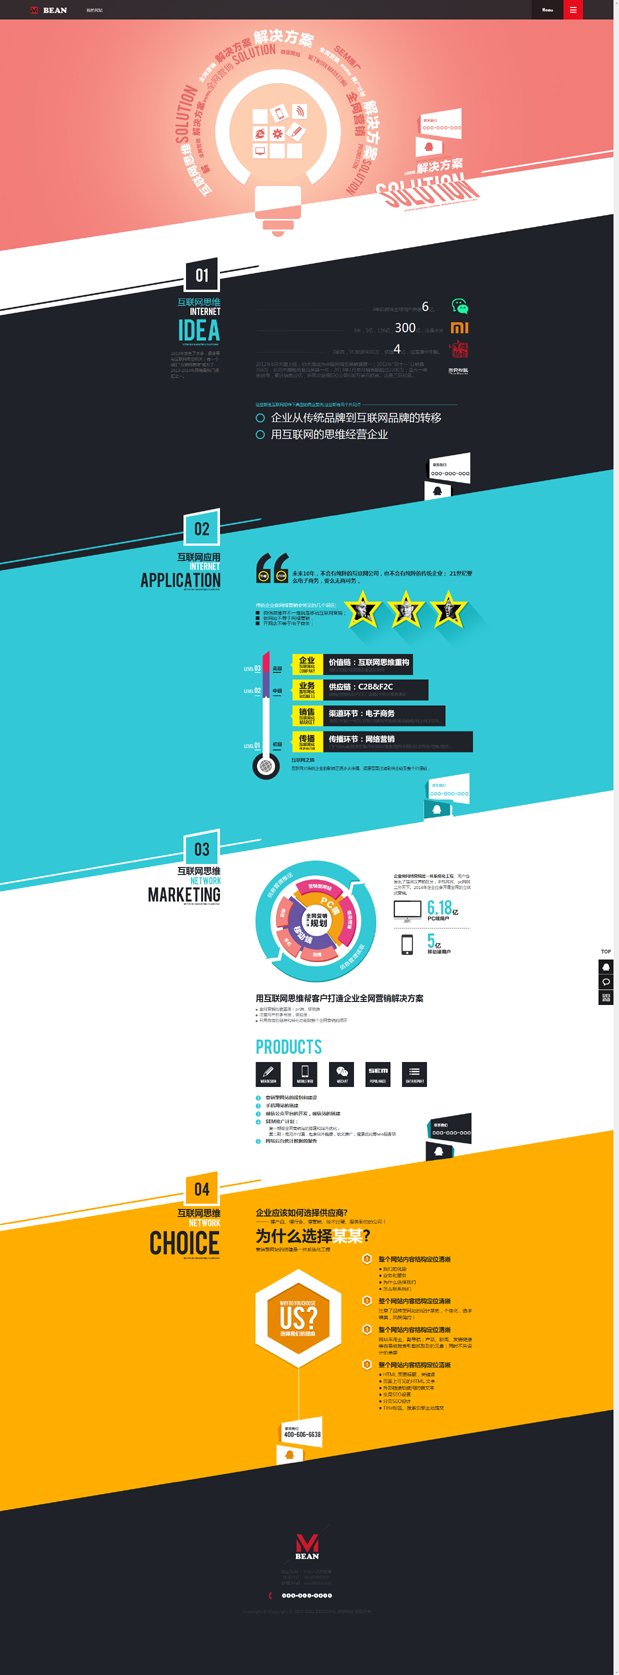 【HTML5】高端网络公司网站源码